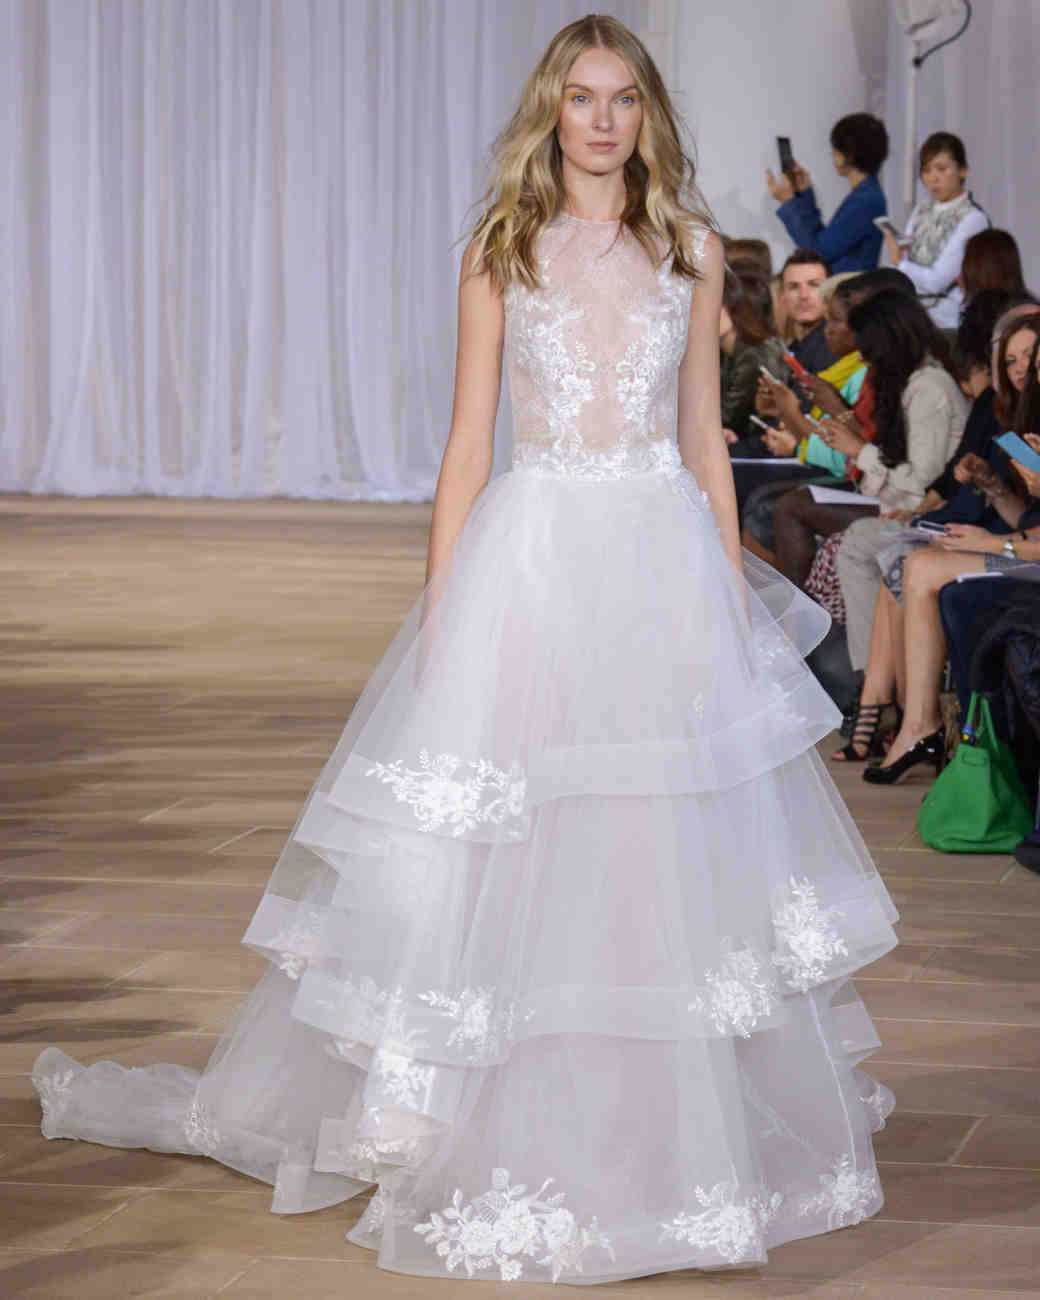 Erfreut Diana Wedding Dress Designer Ideen - Brautkleider Ideen ...